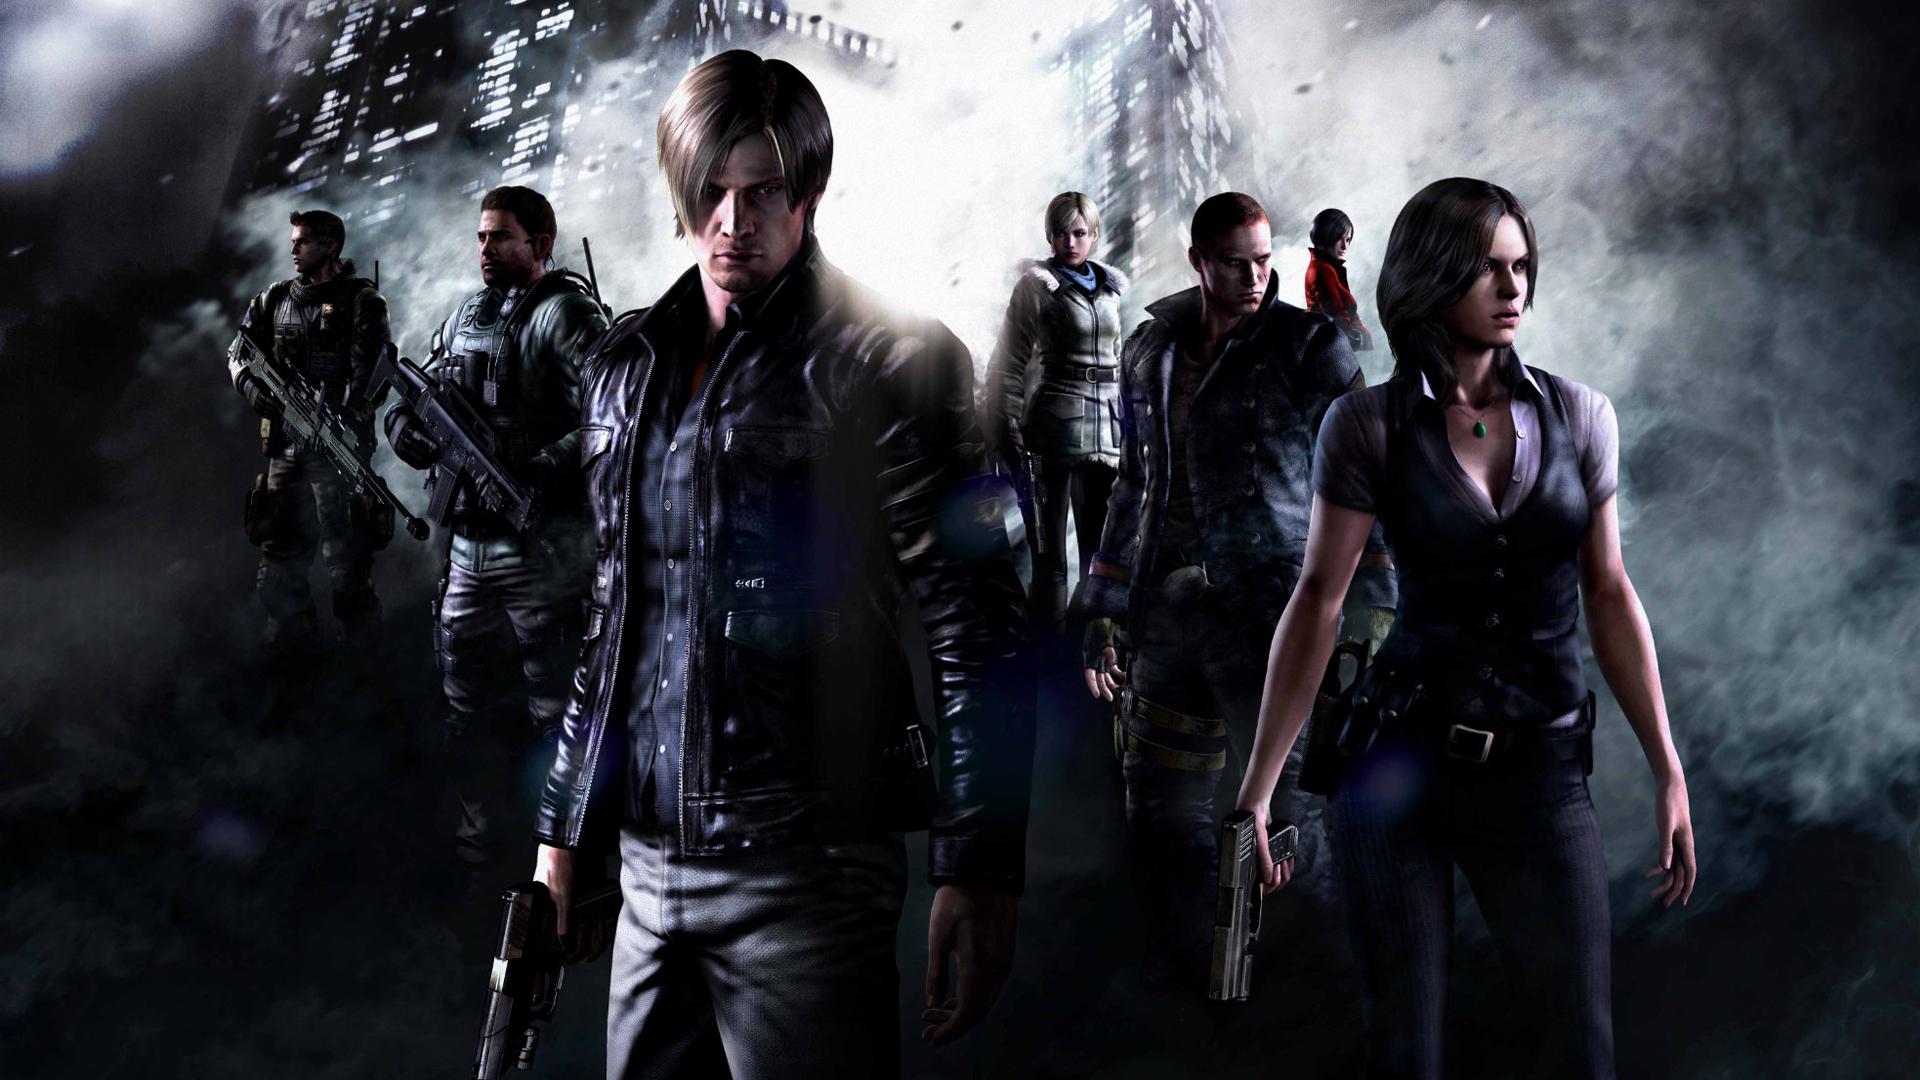 Demo de Resident Evil 6 ya disponible [Let's Kill Zombies]